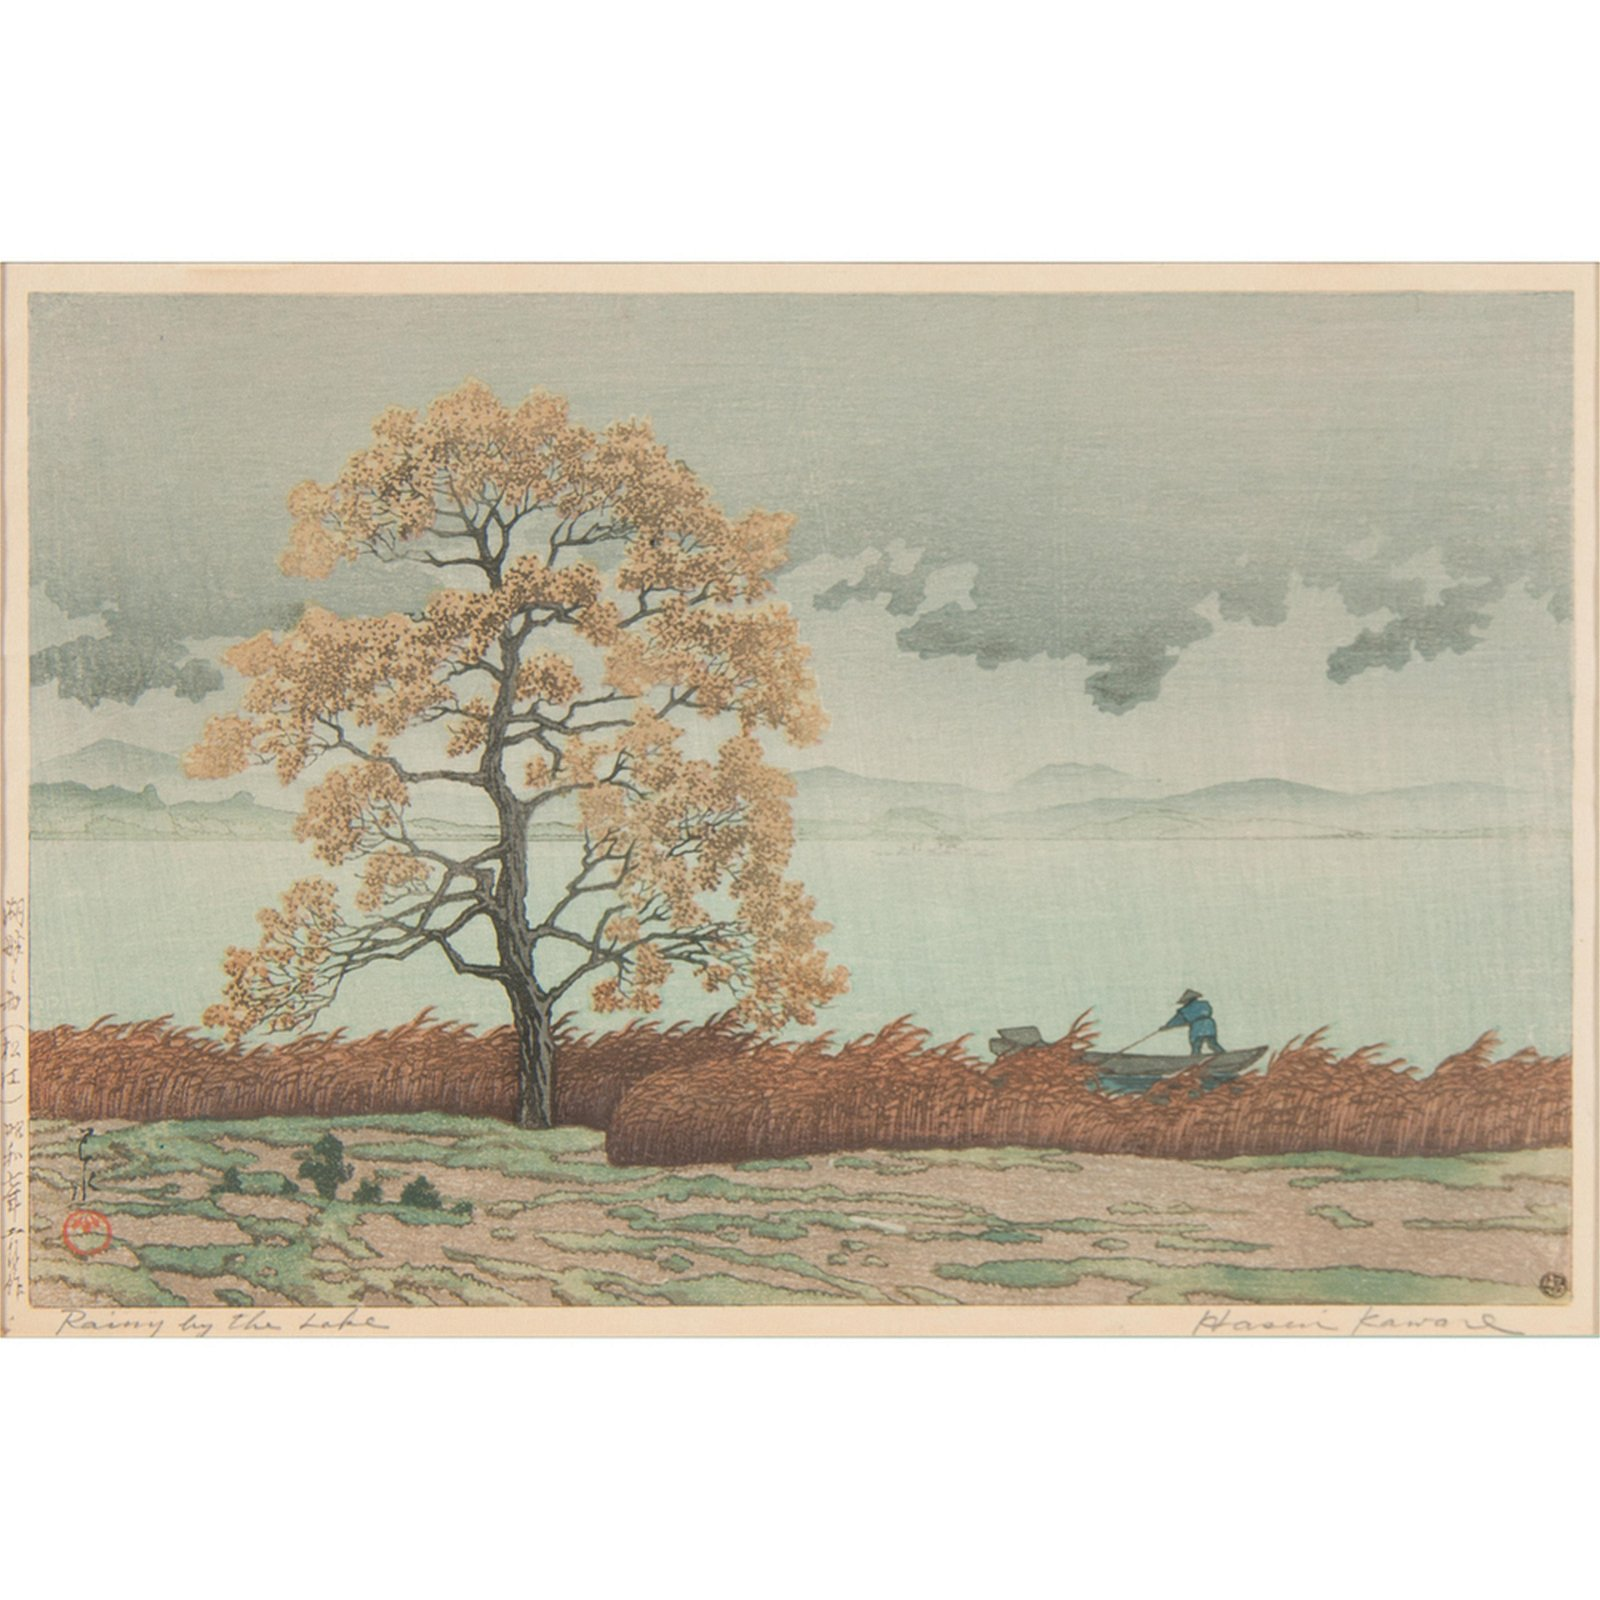 Hasui Kawase (Japanese, 1883-1957)